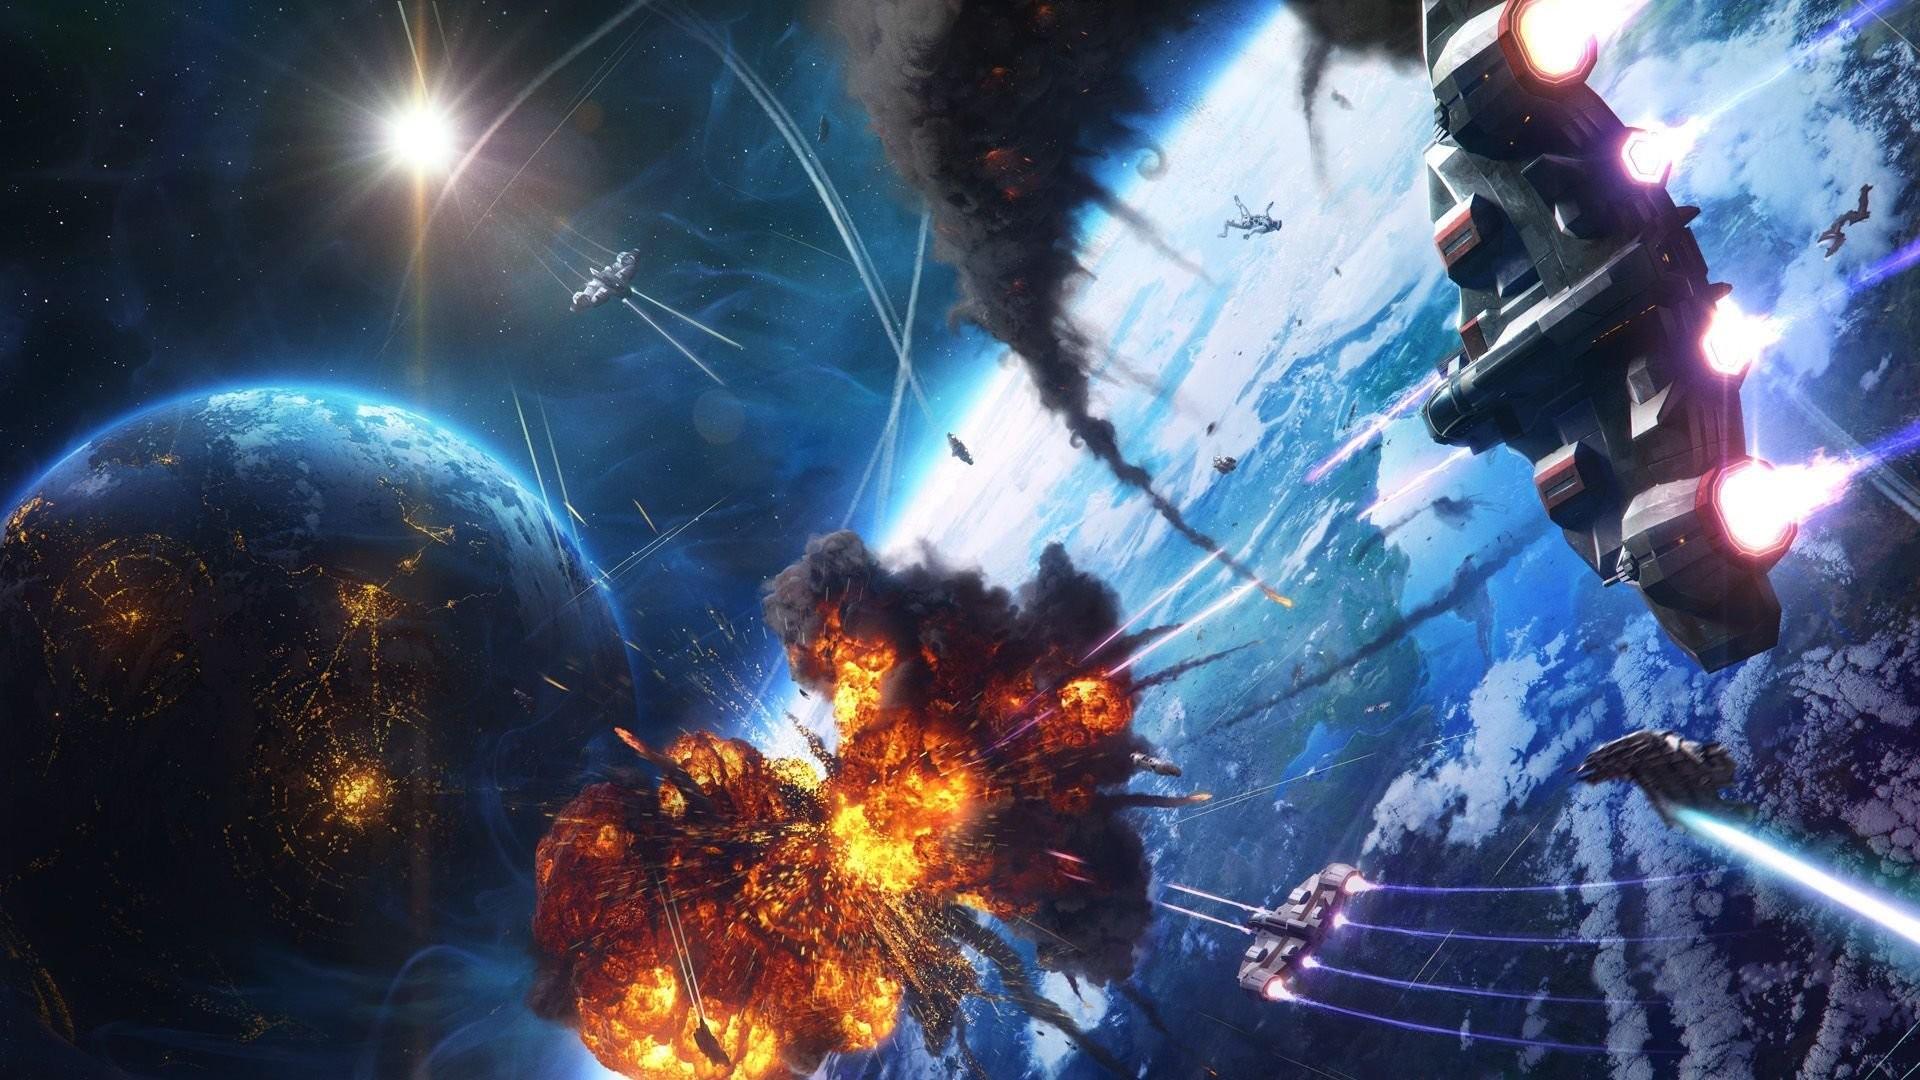 Space Battle Wallpaper